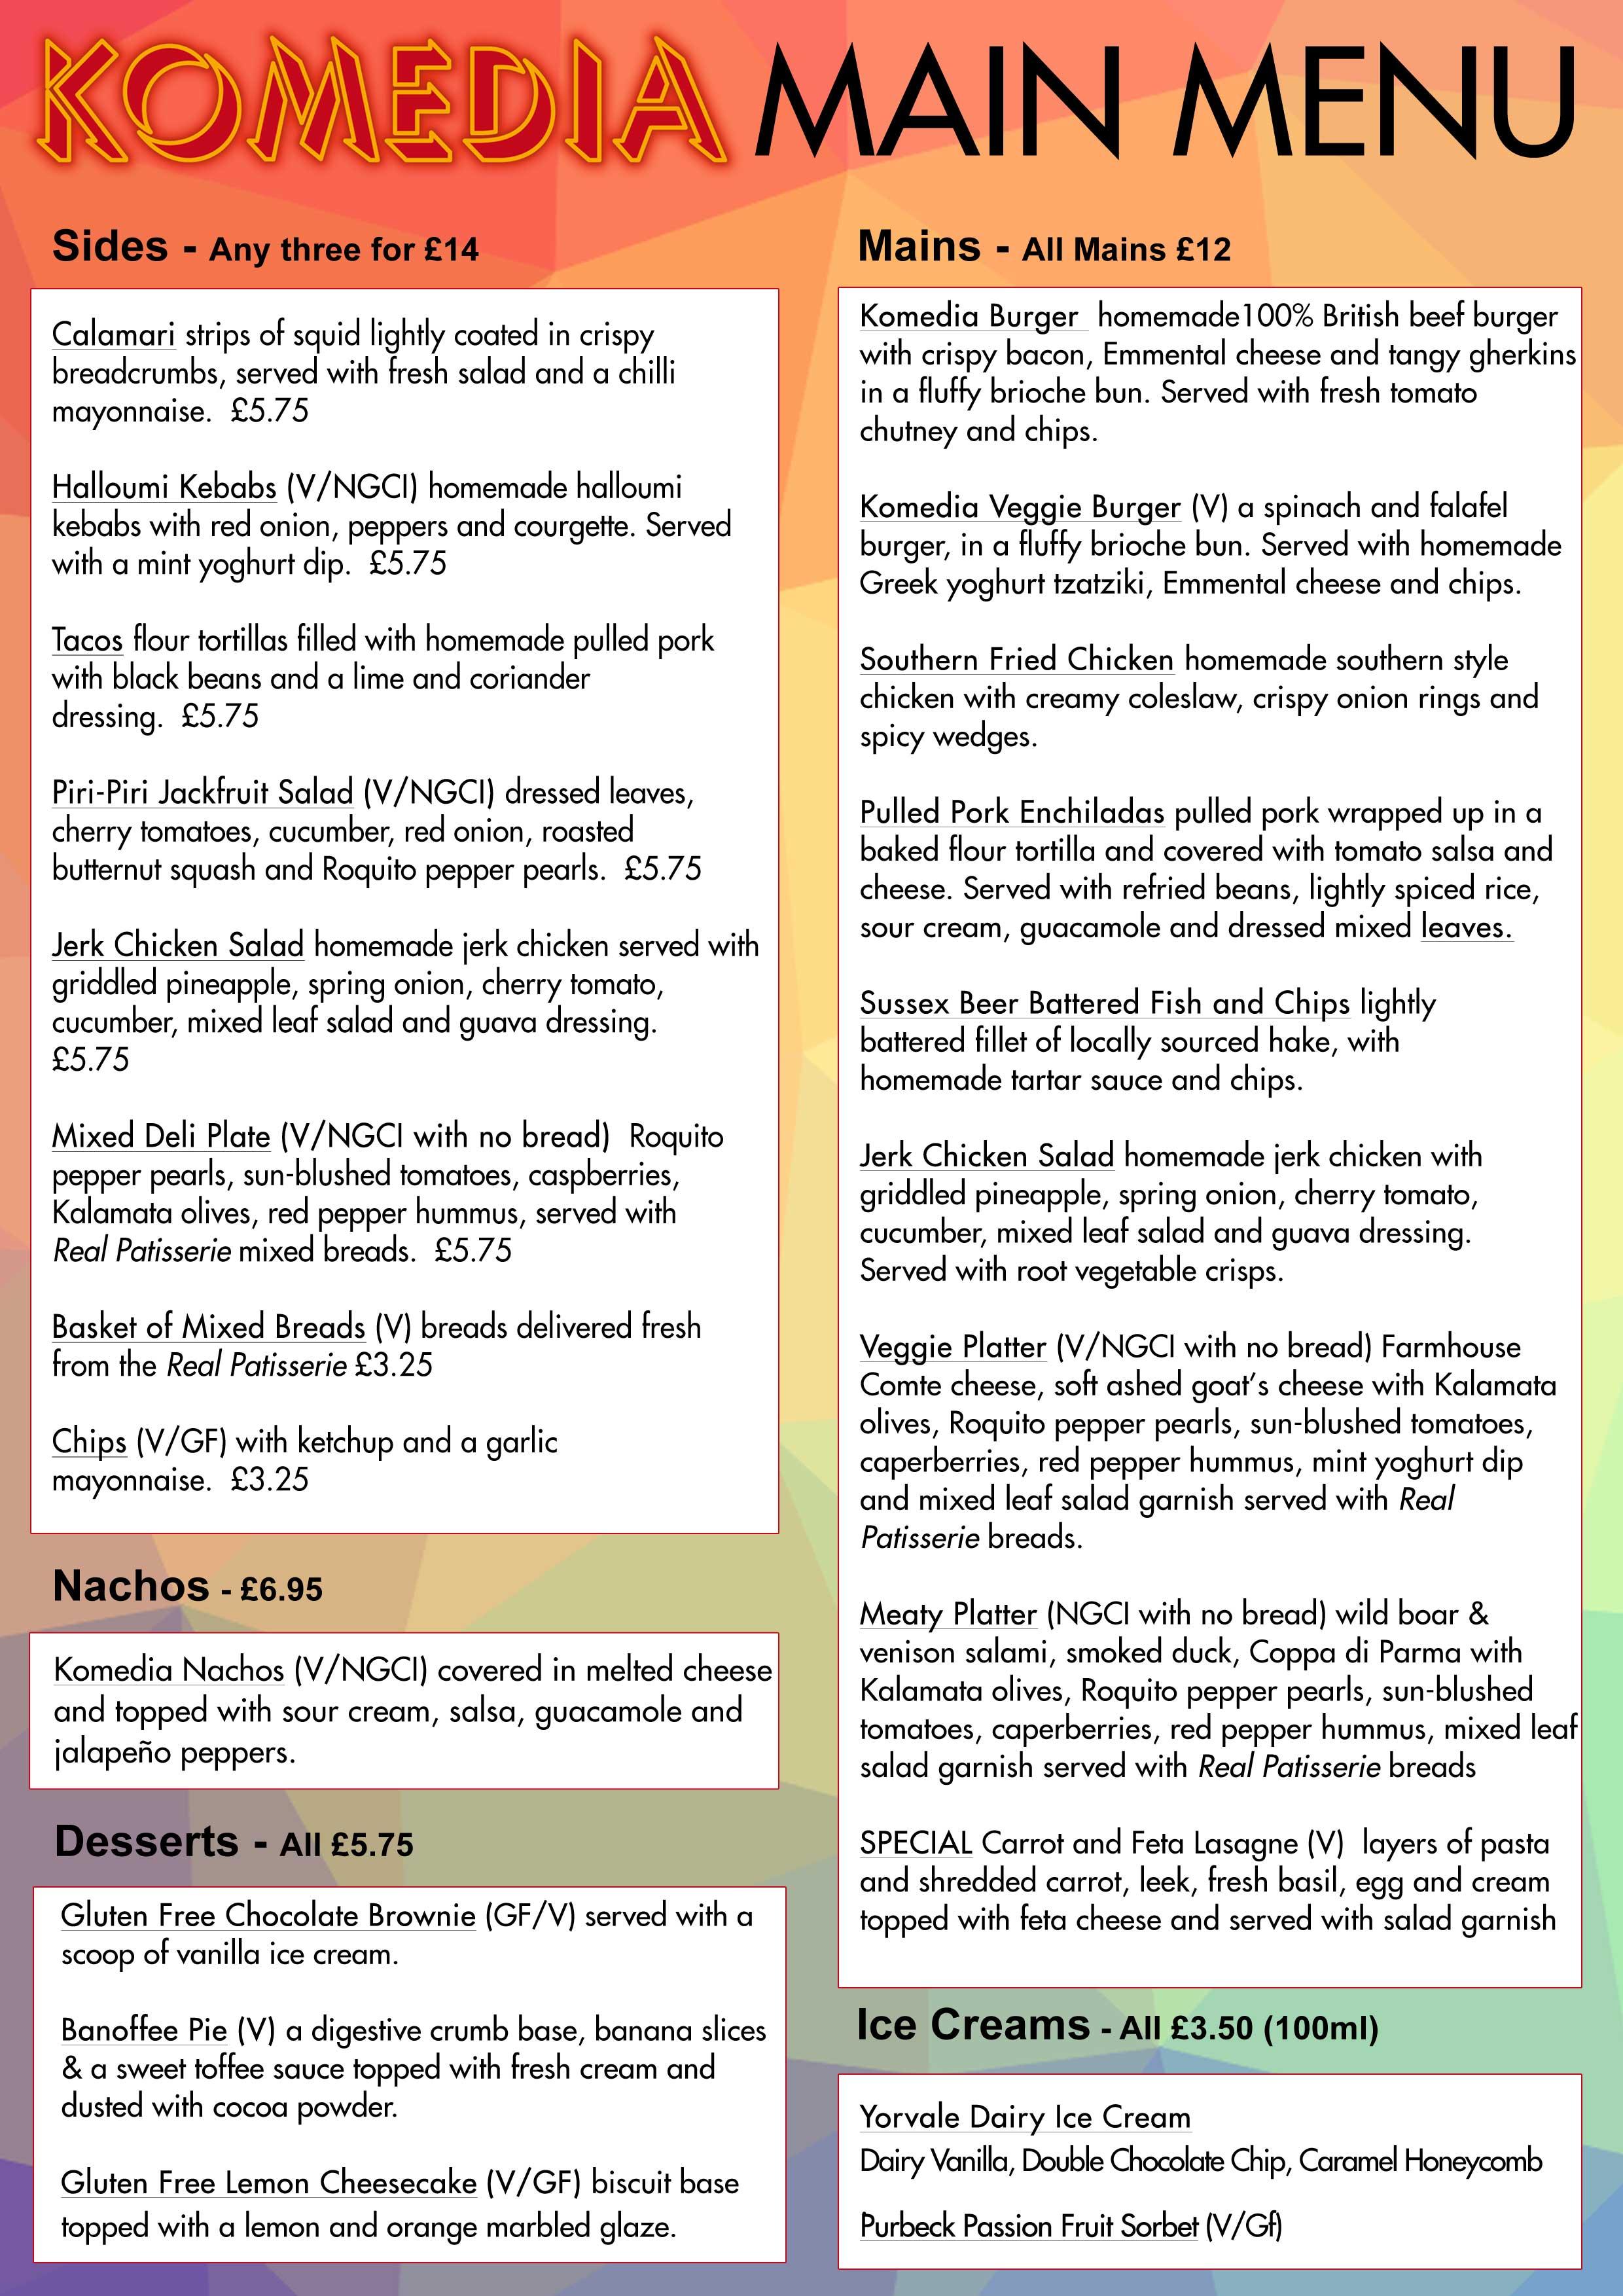 offers komedia brighton view the main menu